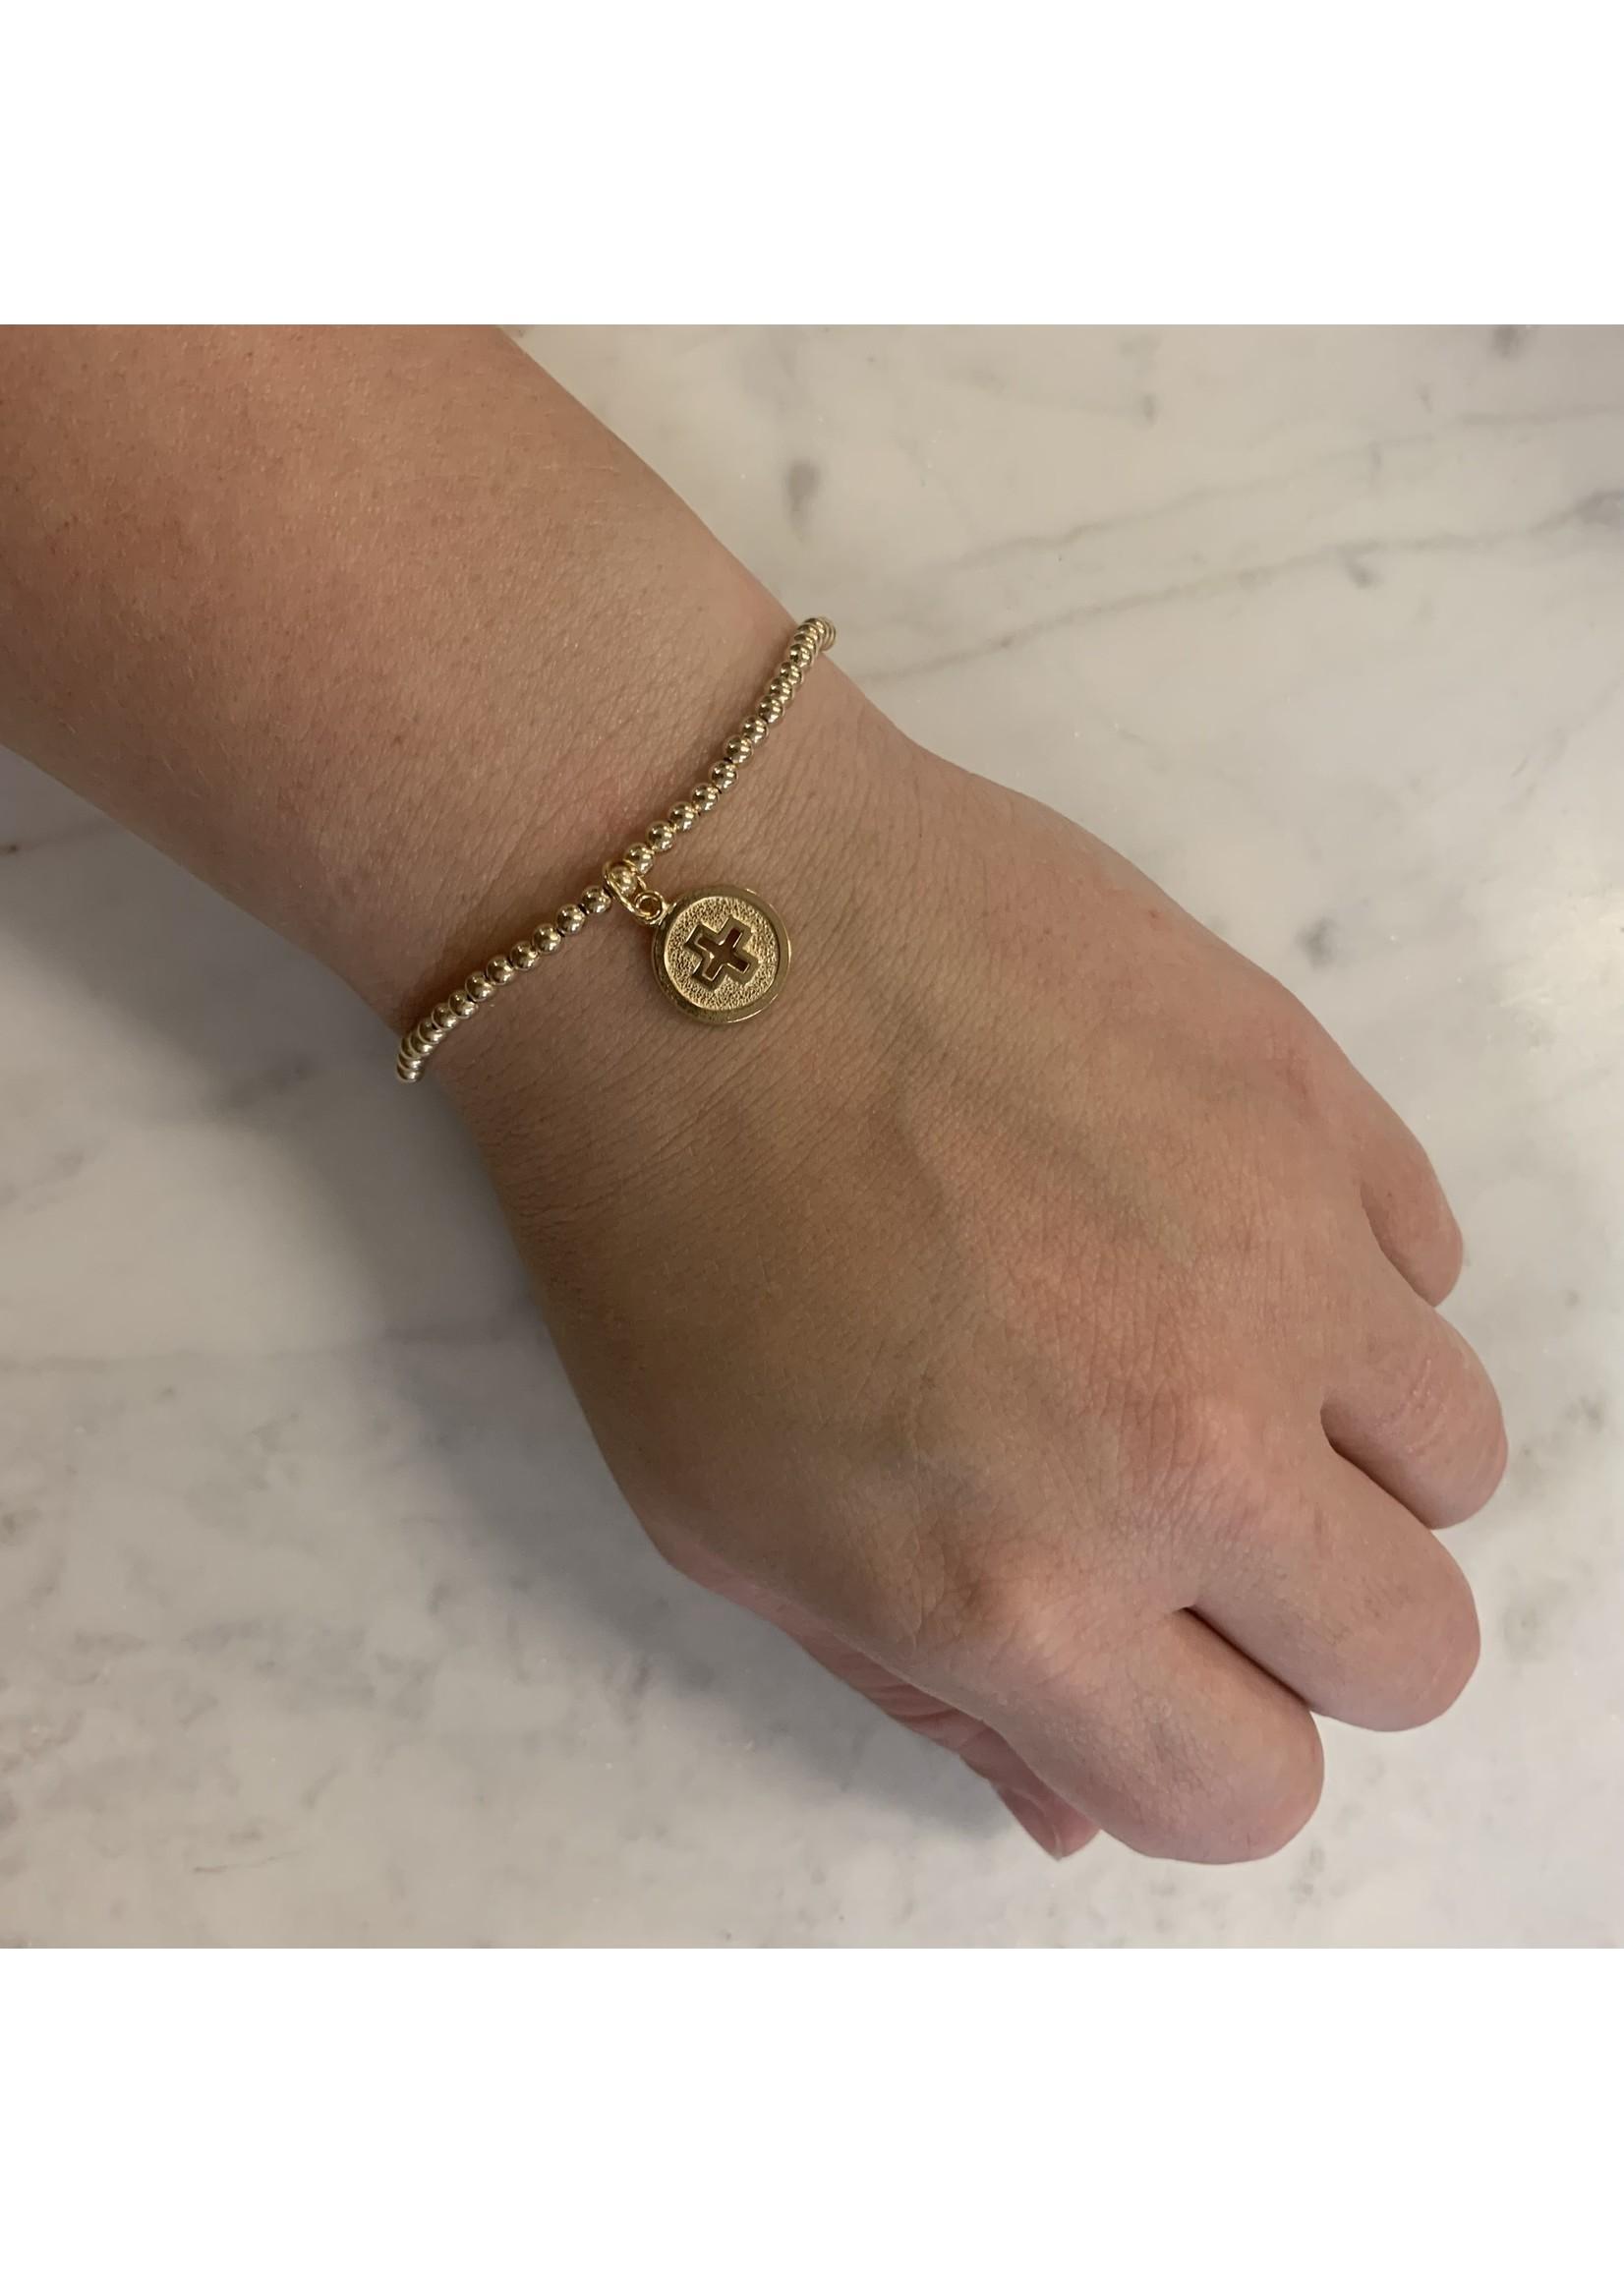 enewton Classic Gold 3mm Bead Bracelet - Signature Cross Gold Disc